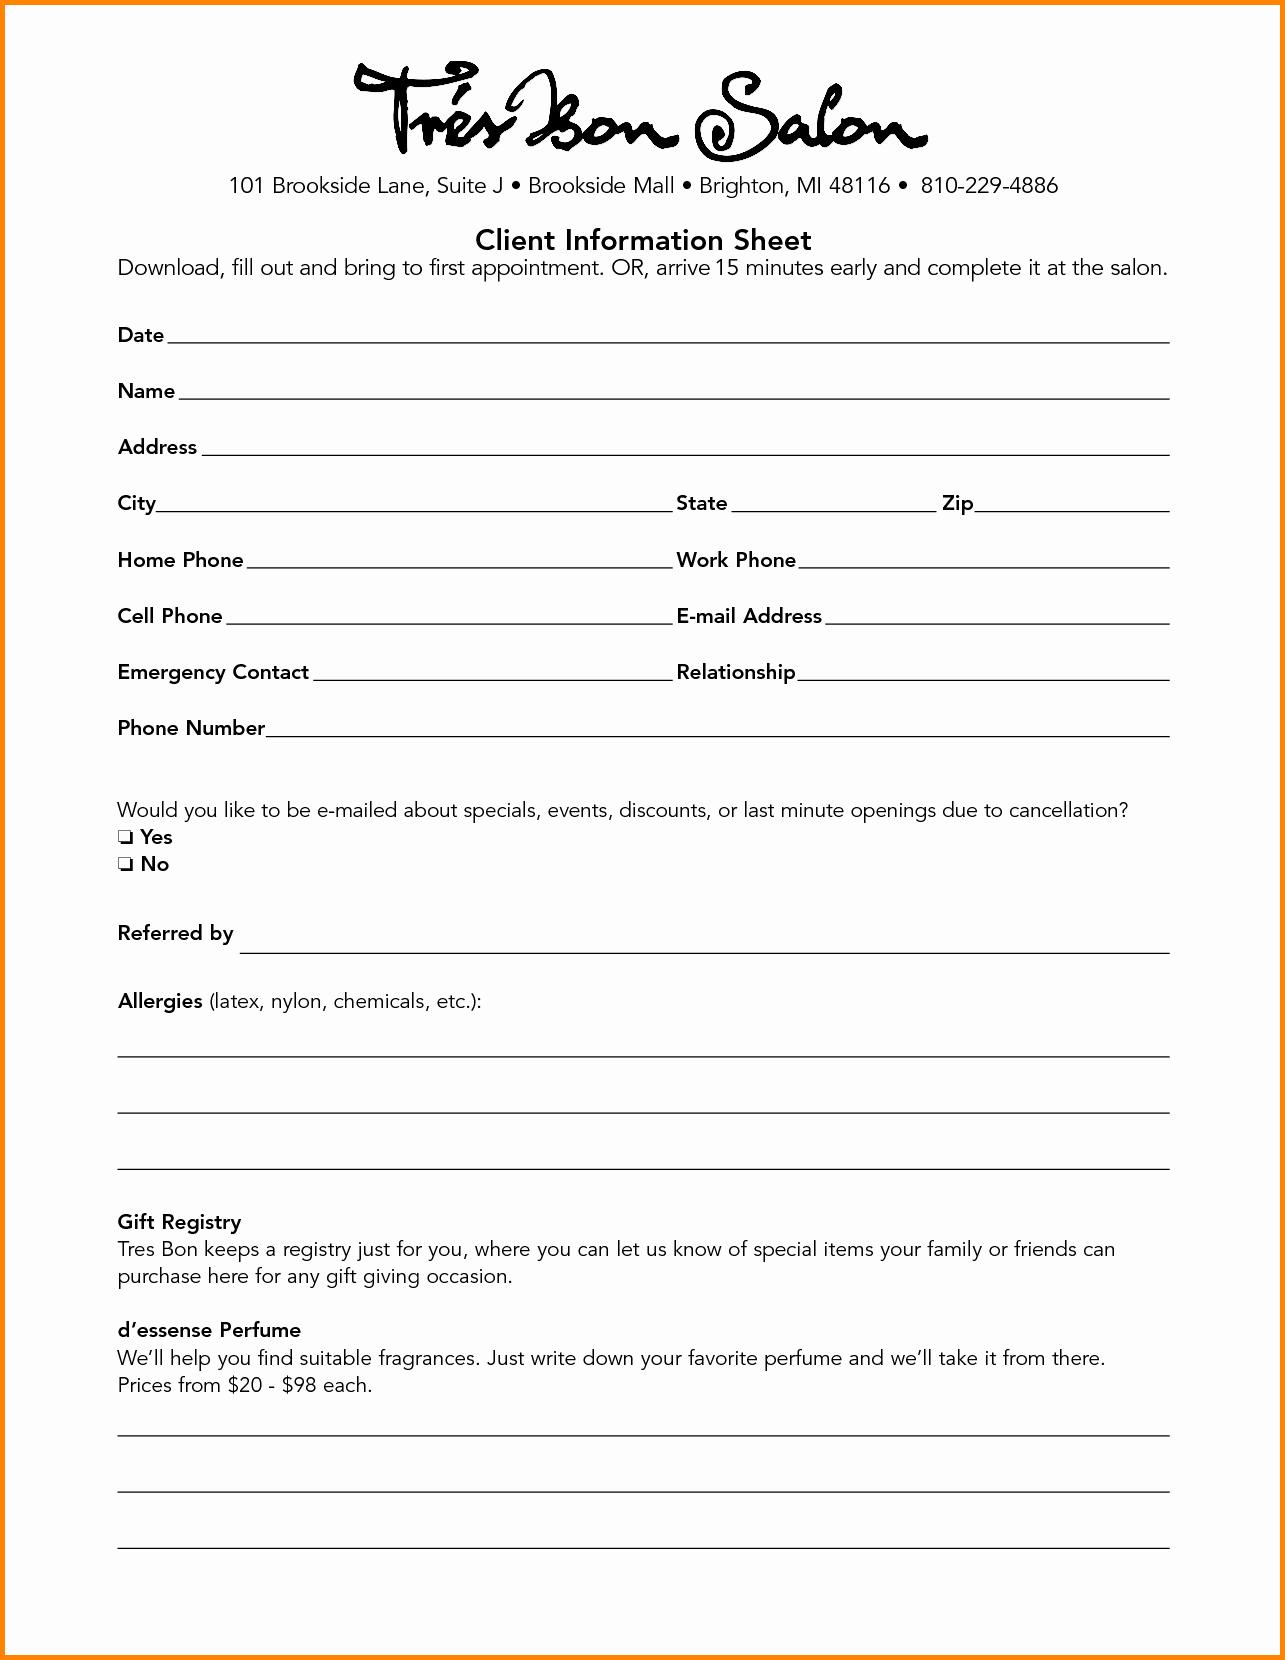 Information Sheet Template Word Portablegasgrillweber